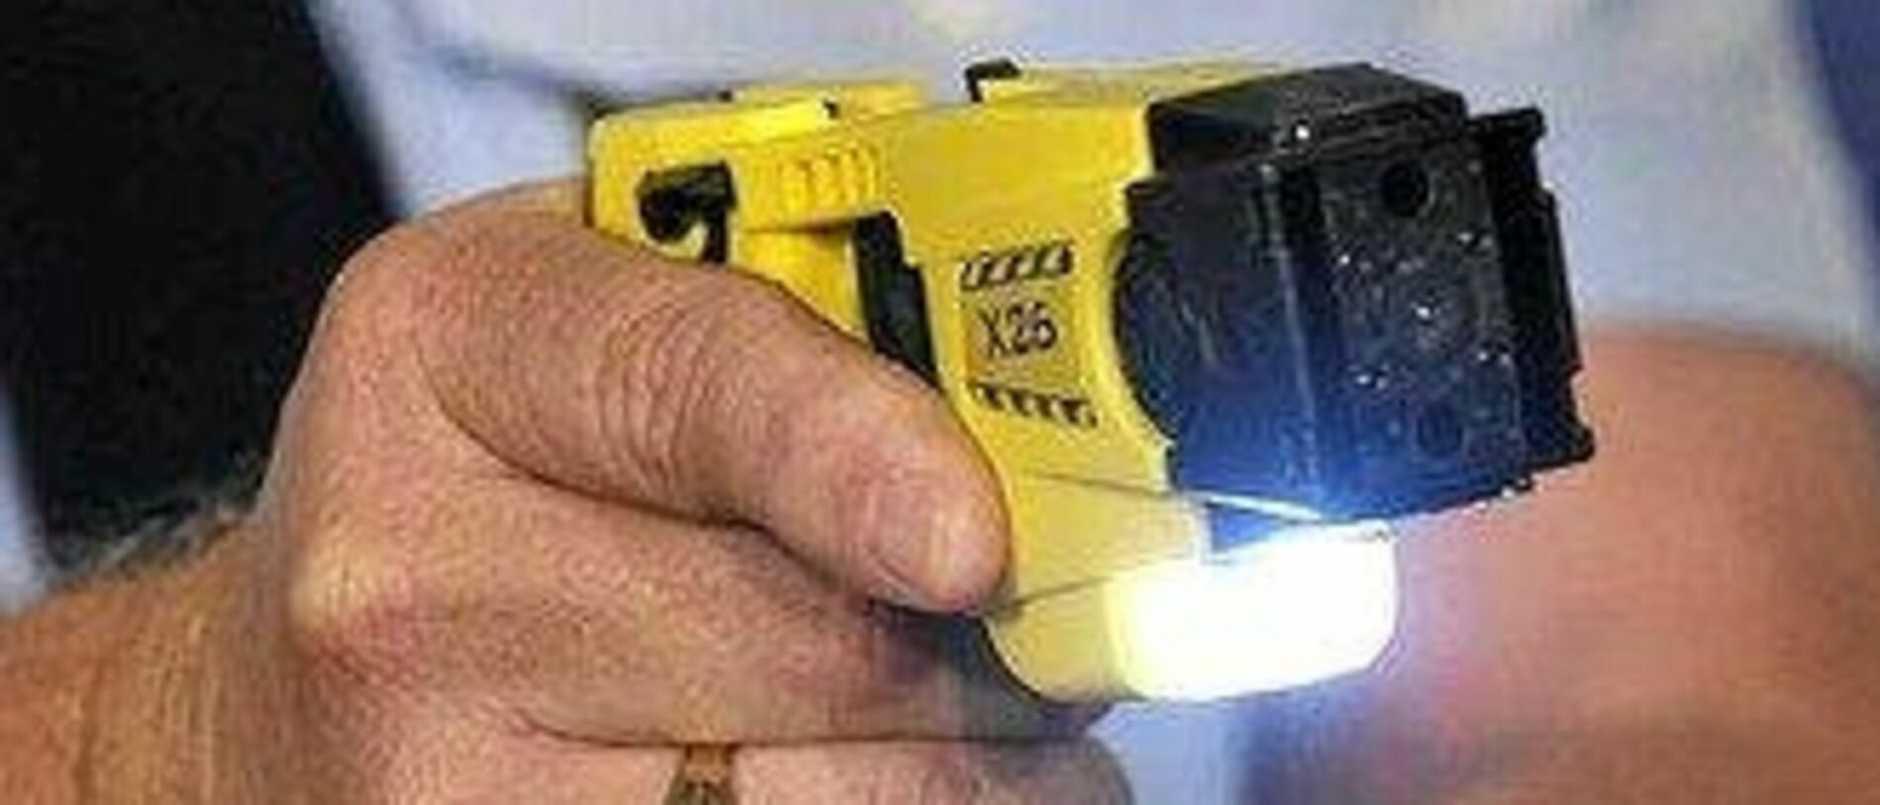 Rollingstone Police forced to taser drunk, half-naked man threatening violenc